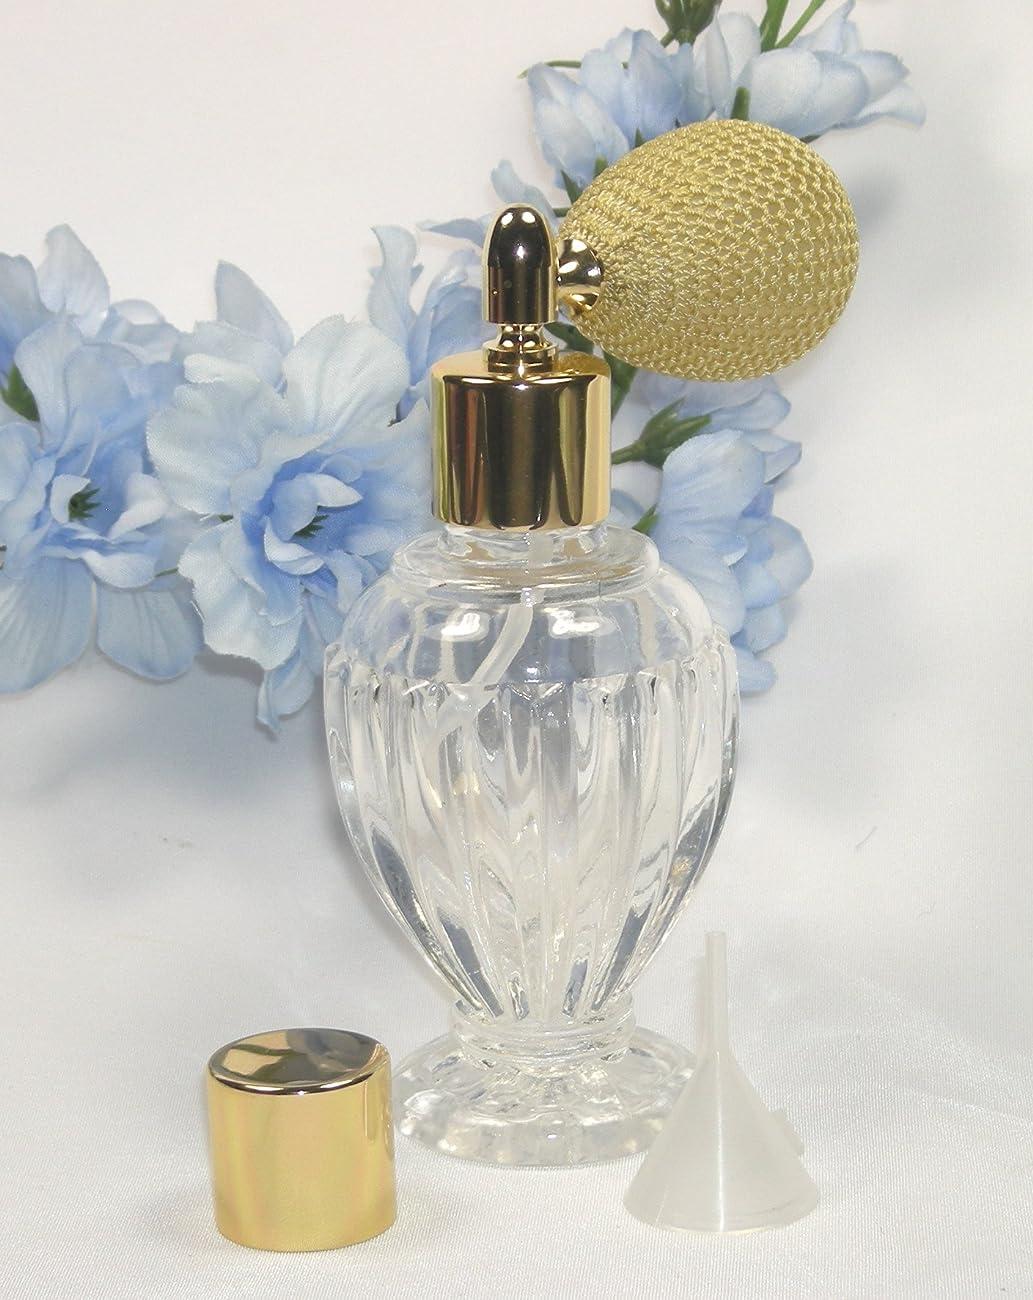 Vintage Style Refillable Empty Glass Perfume Bottle Gold Bulb Spray Atomizer 1.64 Oz 1